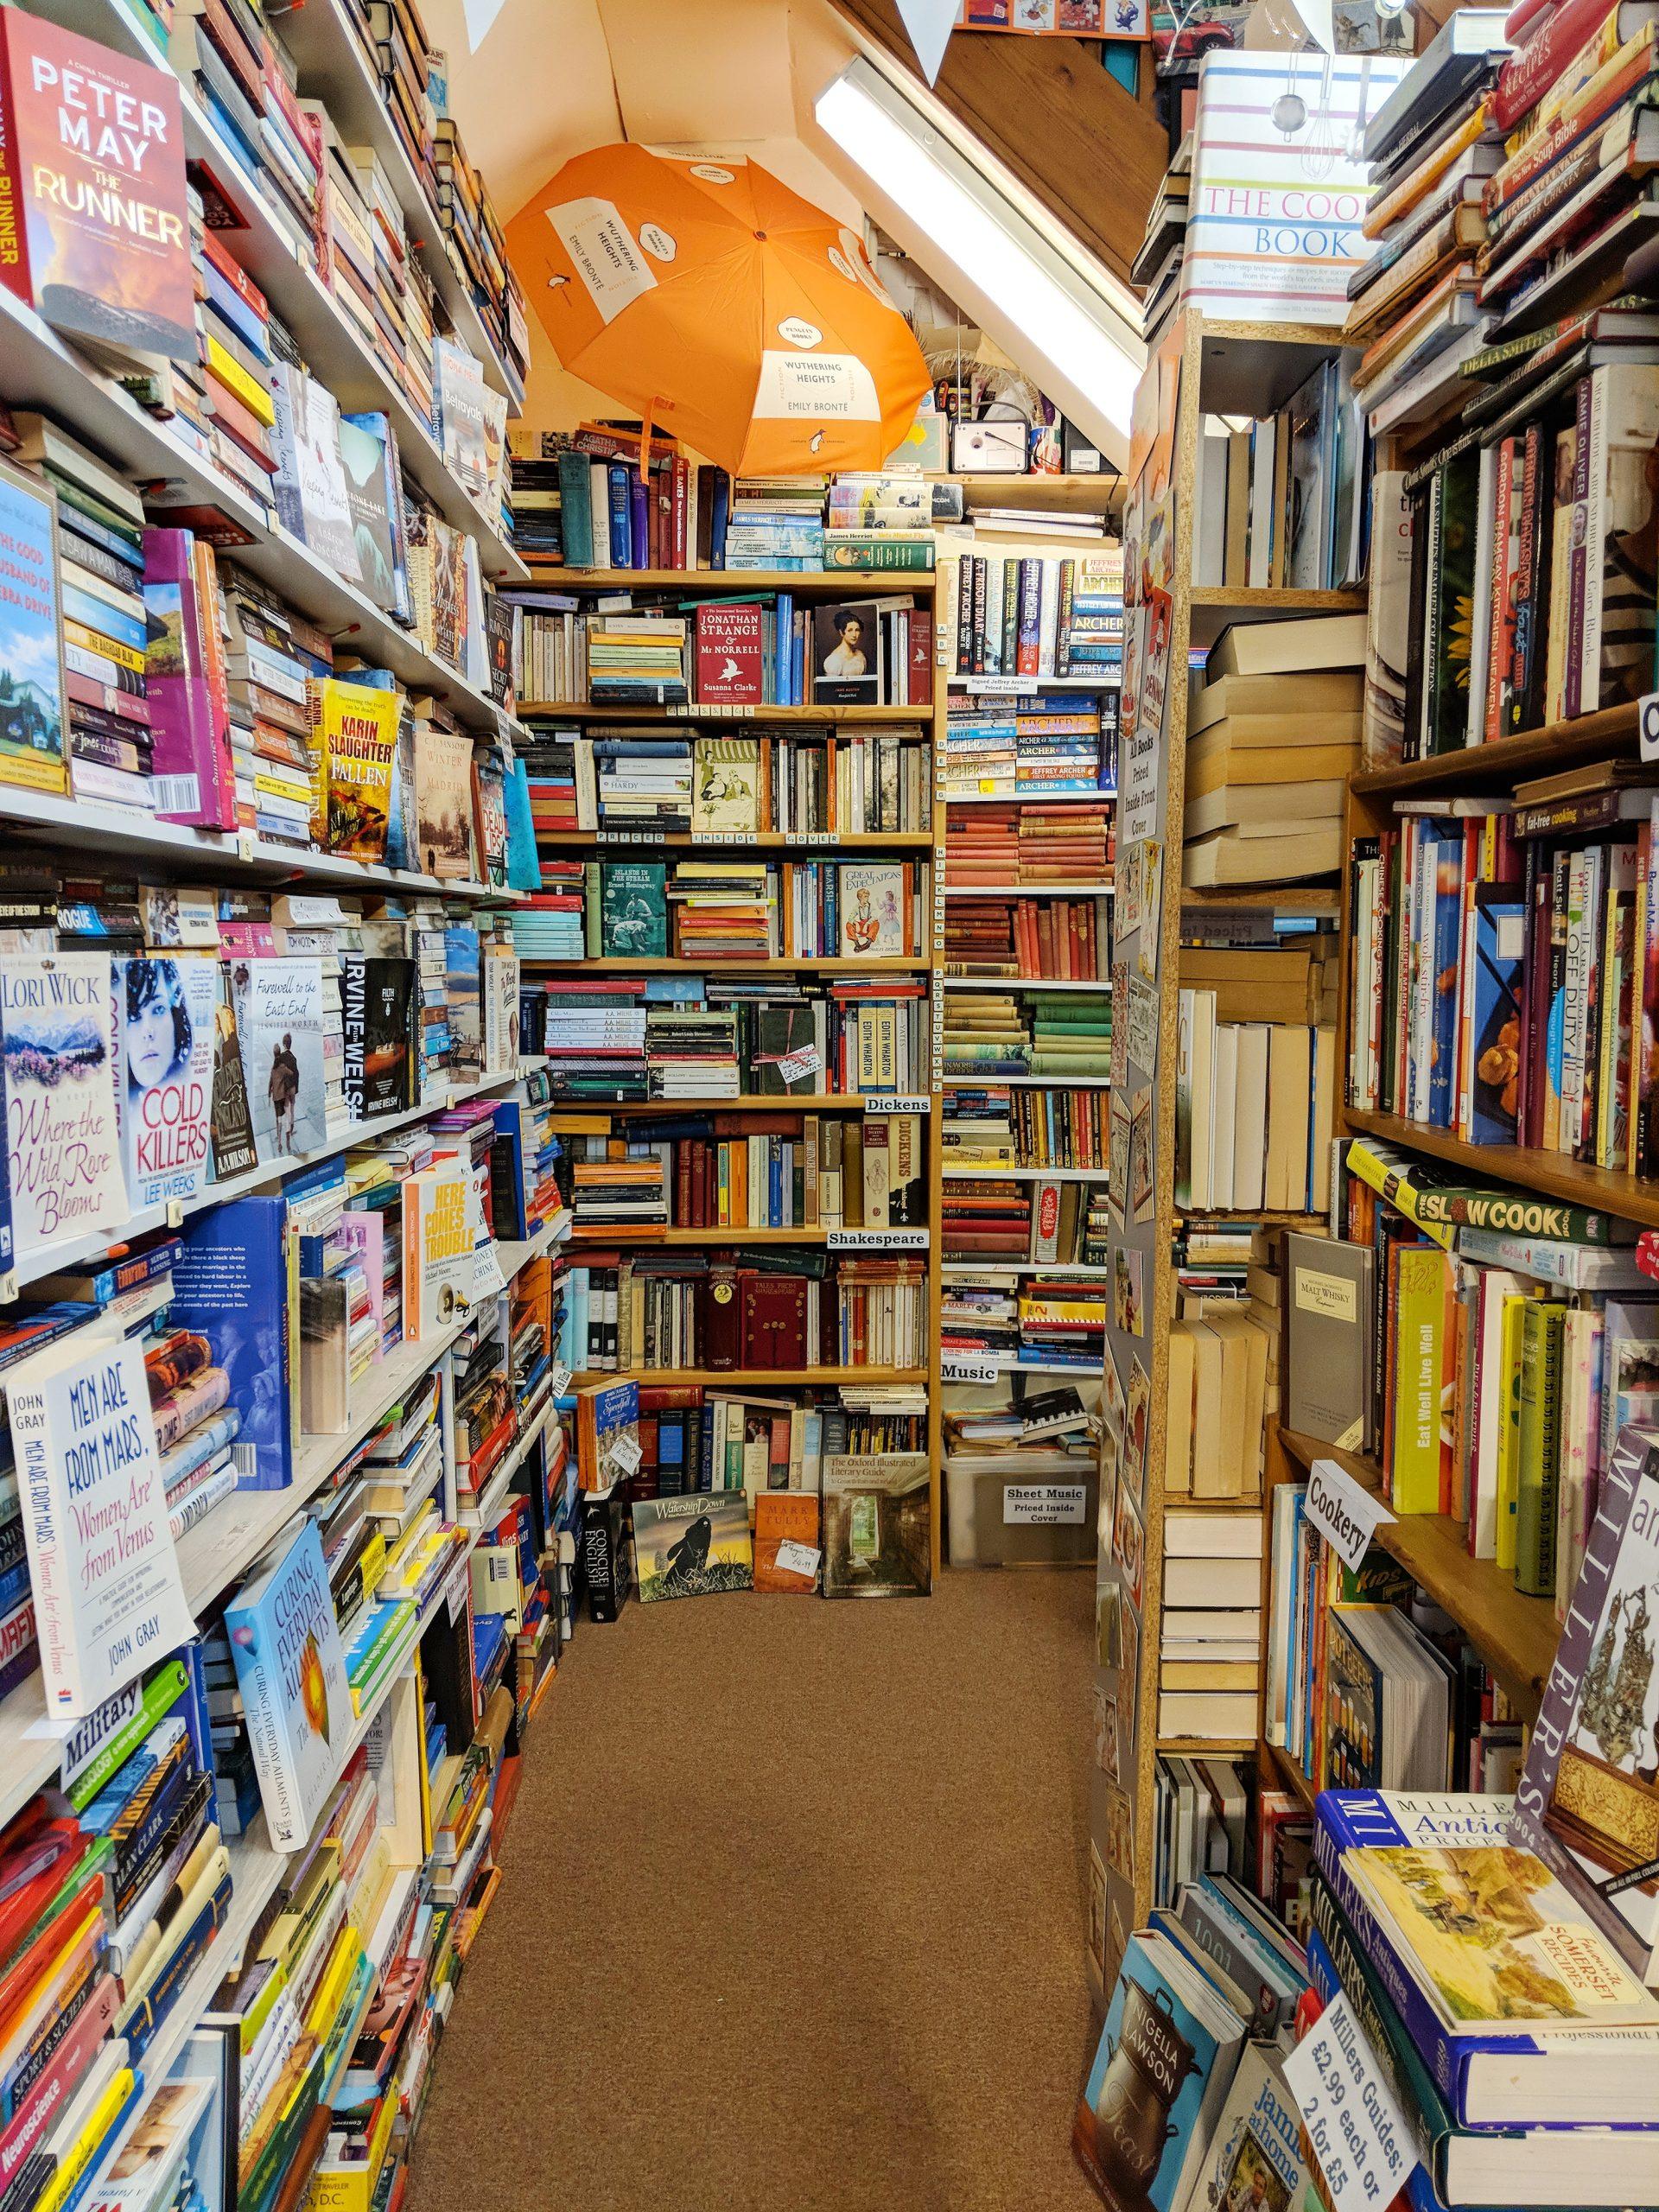 secondhand classic books for sale in the ironbridge bookshop